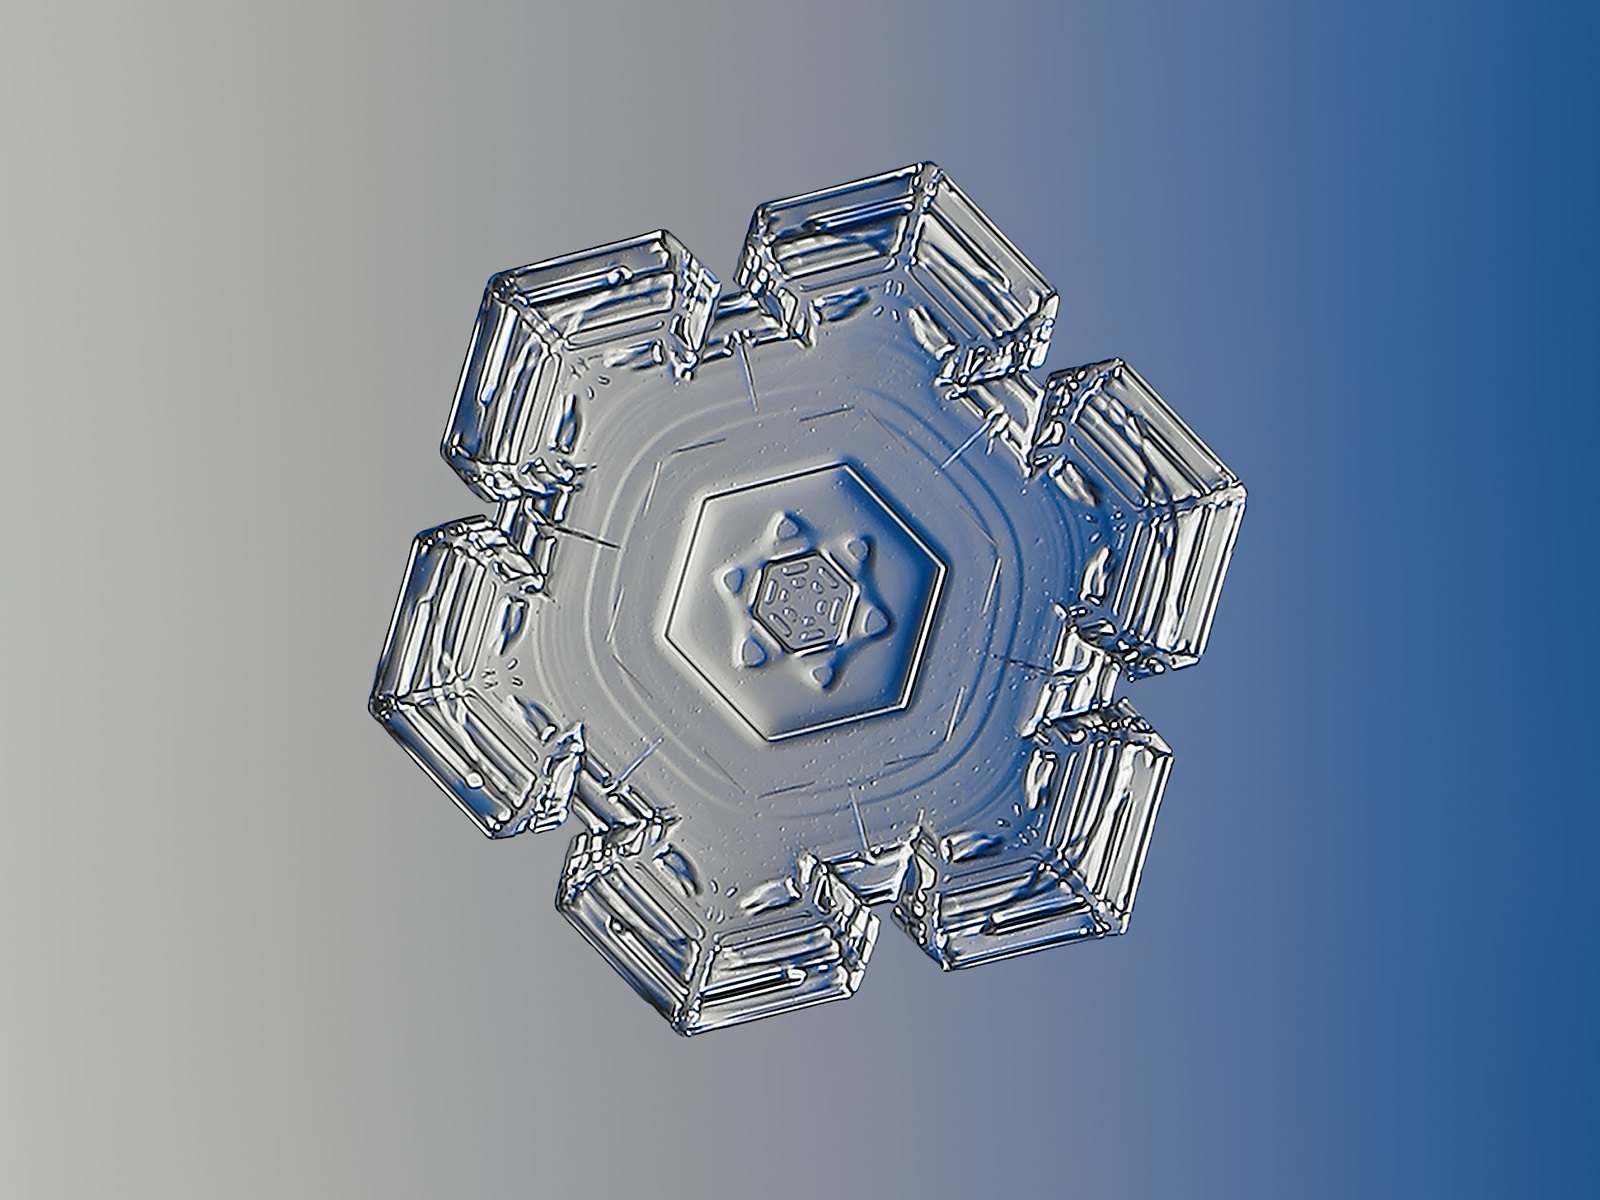 Snowflake (explore 16 Dec 2020)